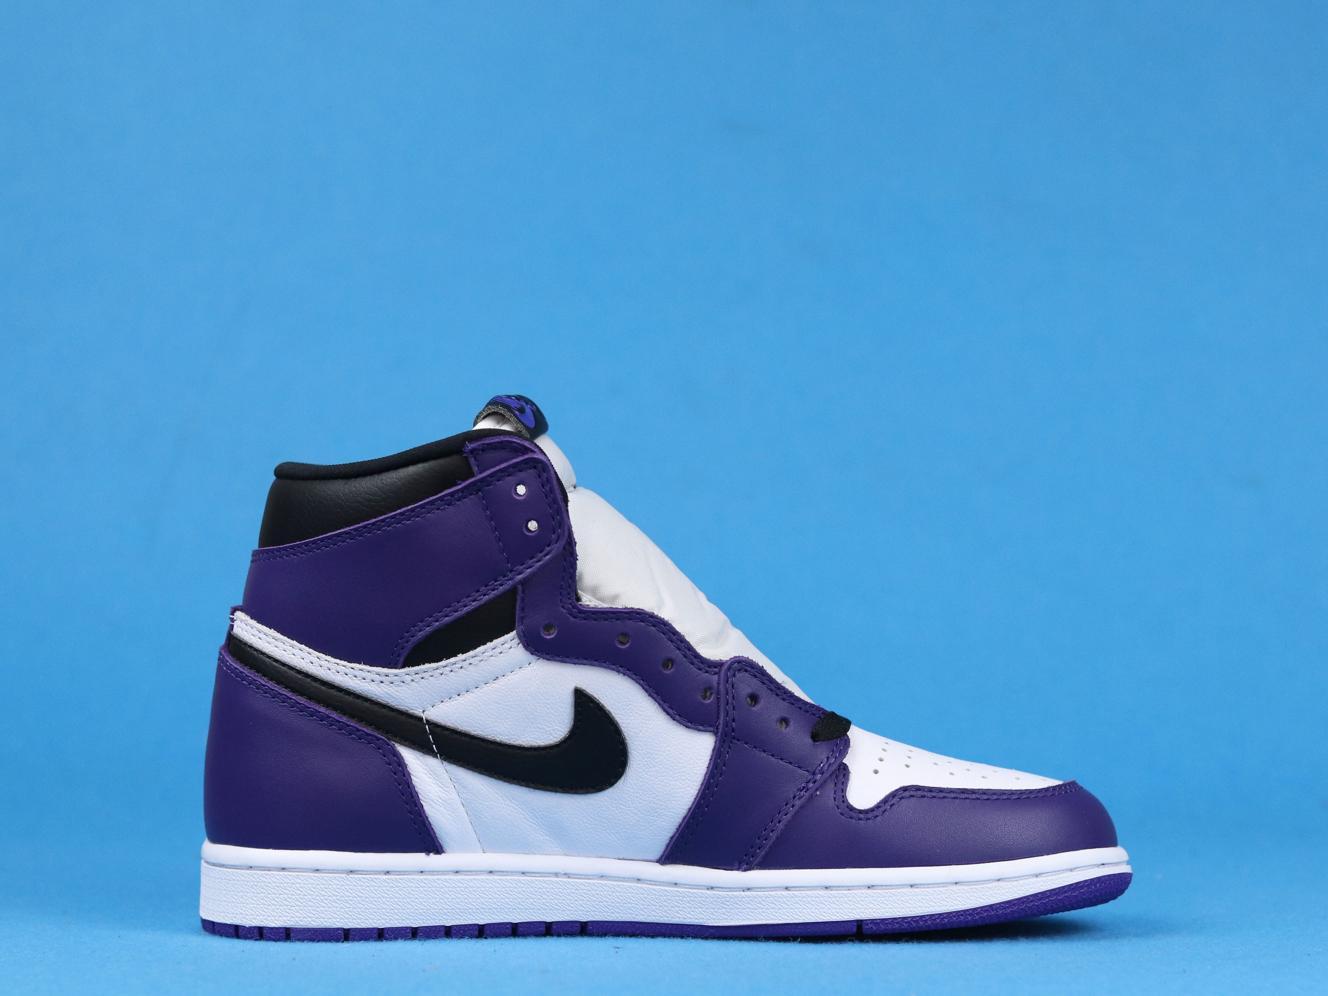 Air Jordan 1 Retro High OG Court Purple 2.0 2